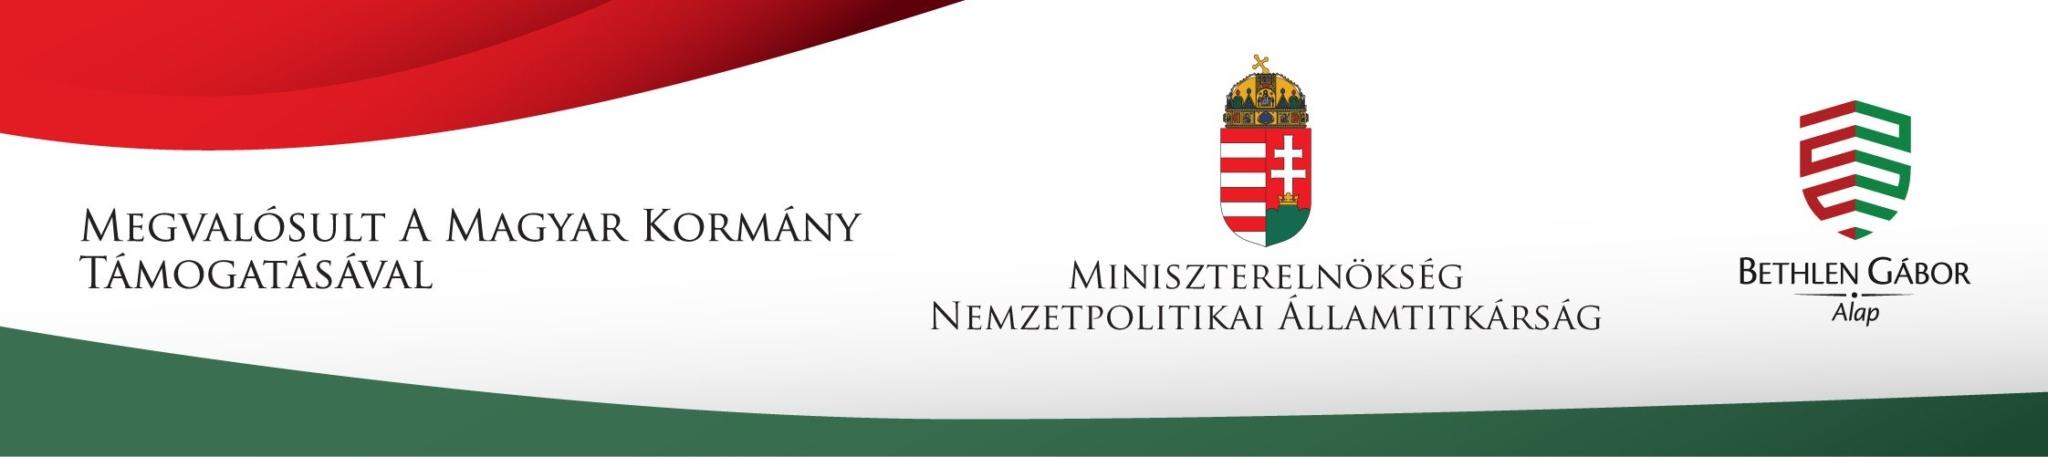 Bethlen Gábor Alapítvány logó